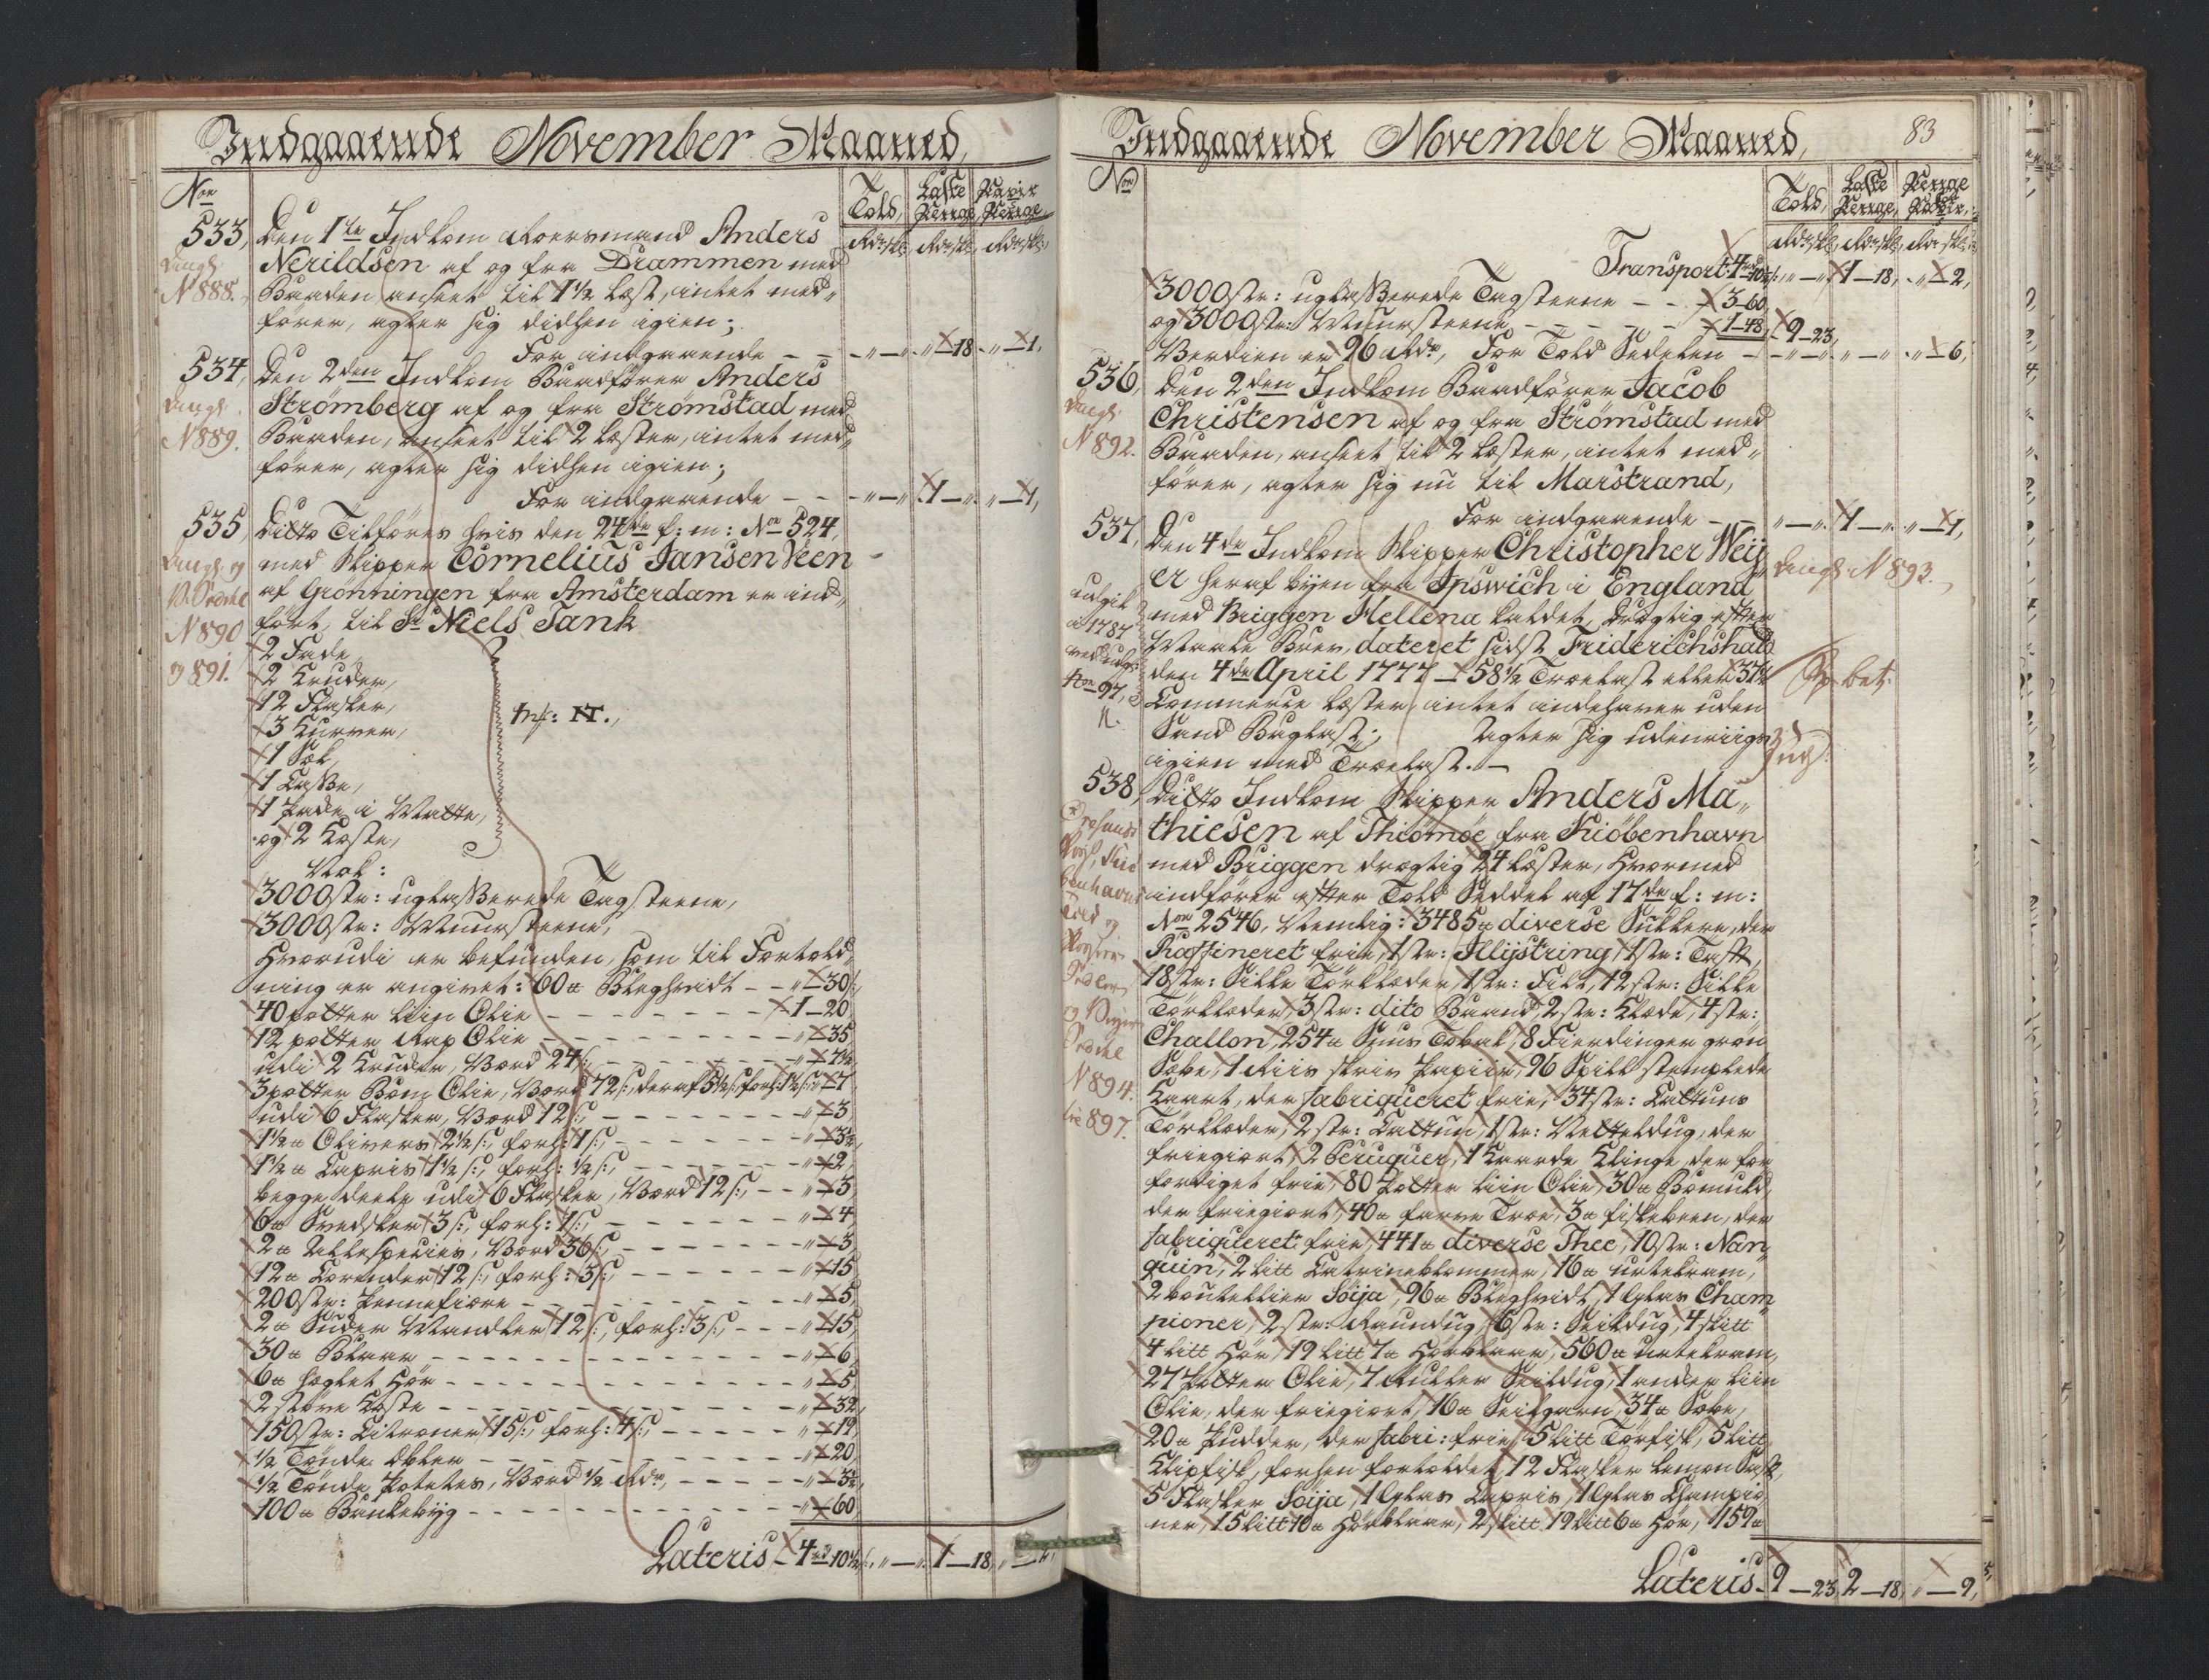 RA, Generaltollkammeret, tollregnskaper, R01/L0130: Tollregnskaper Fredrikshald, 1786, s. 82b-83a